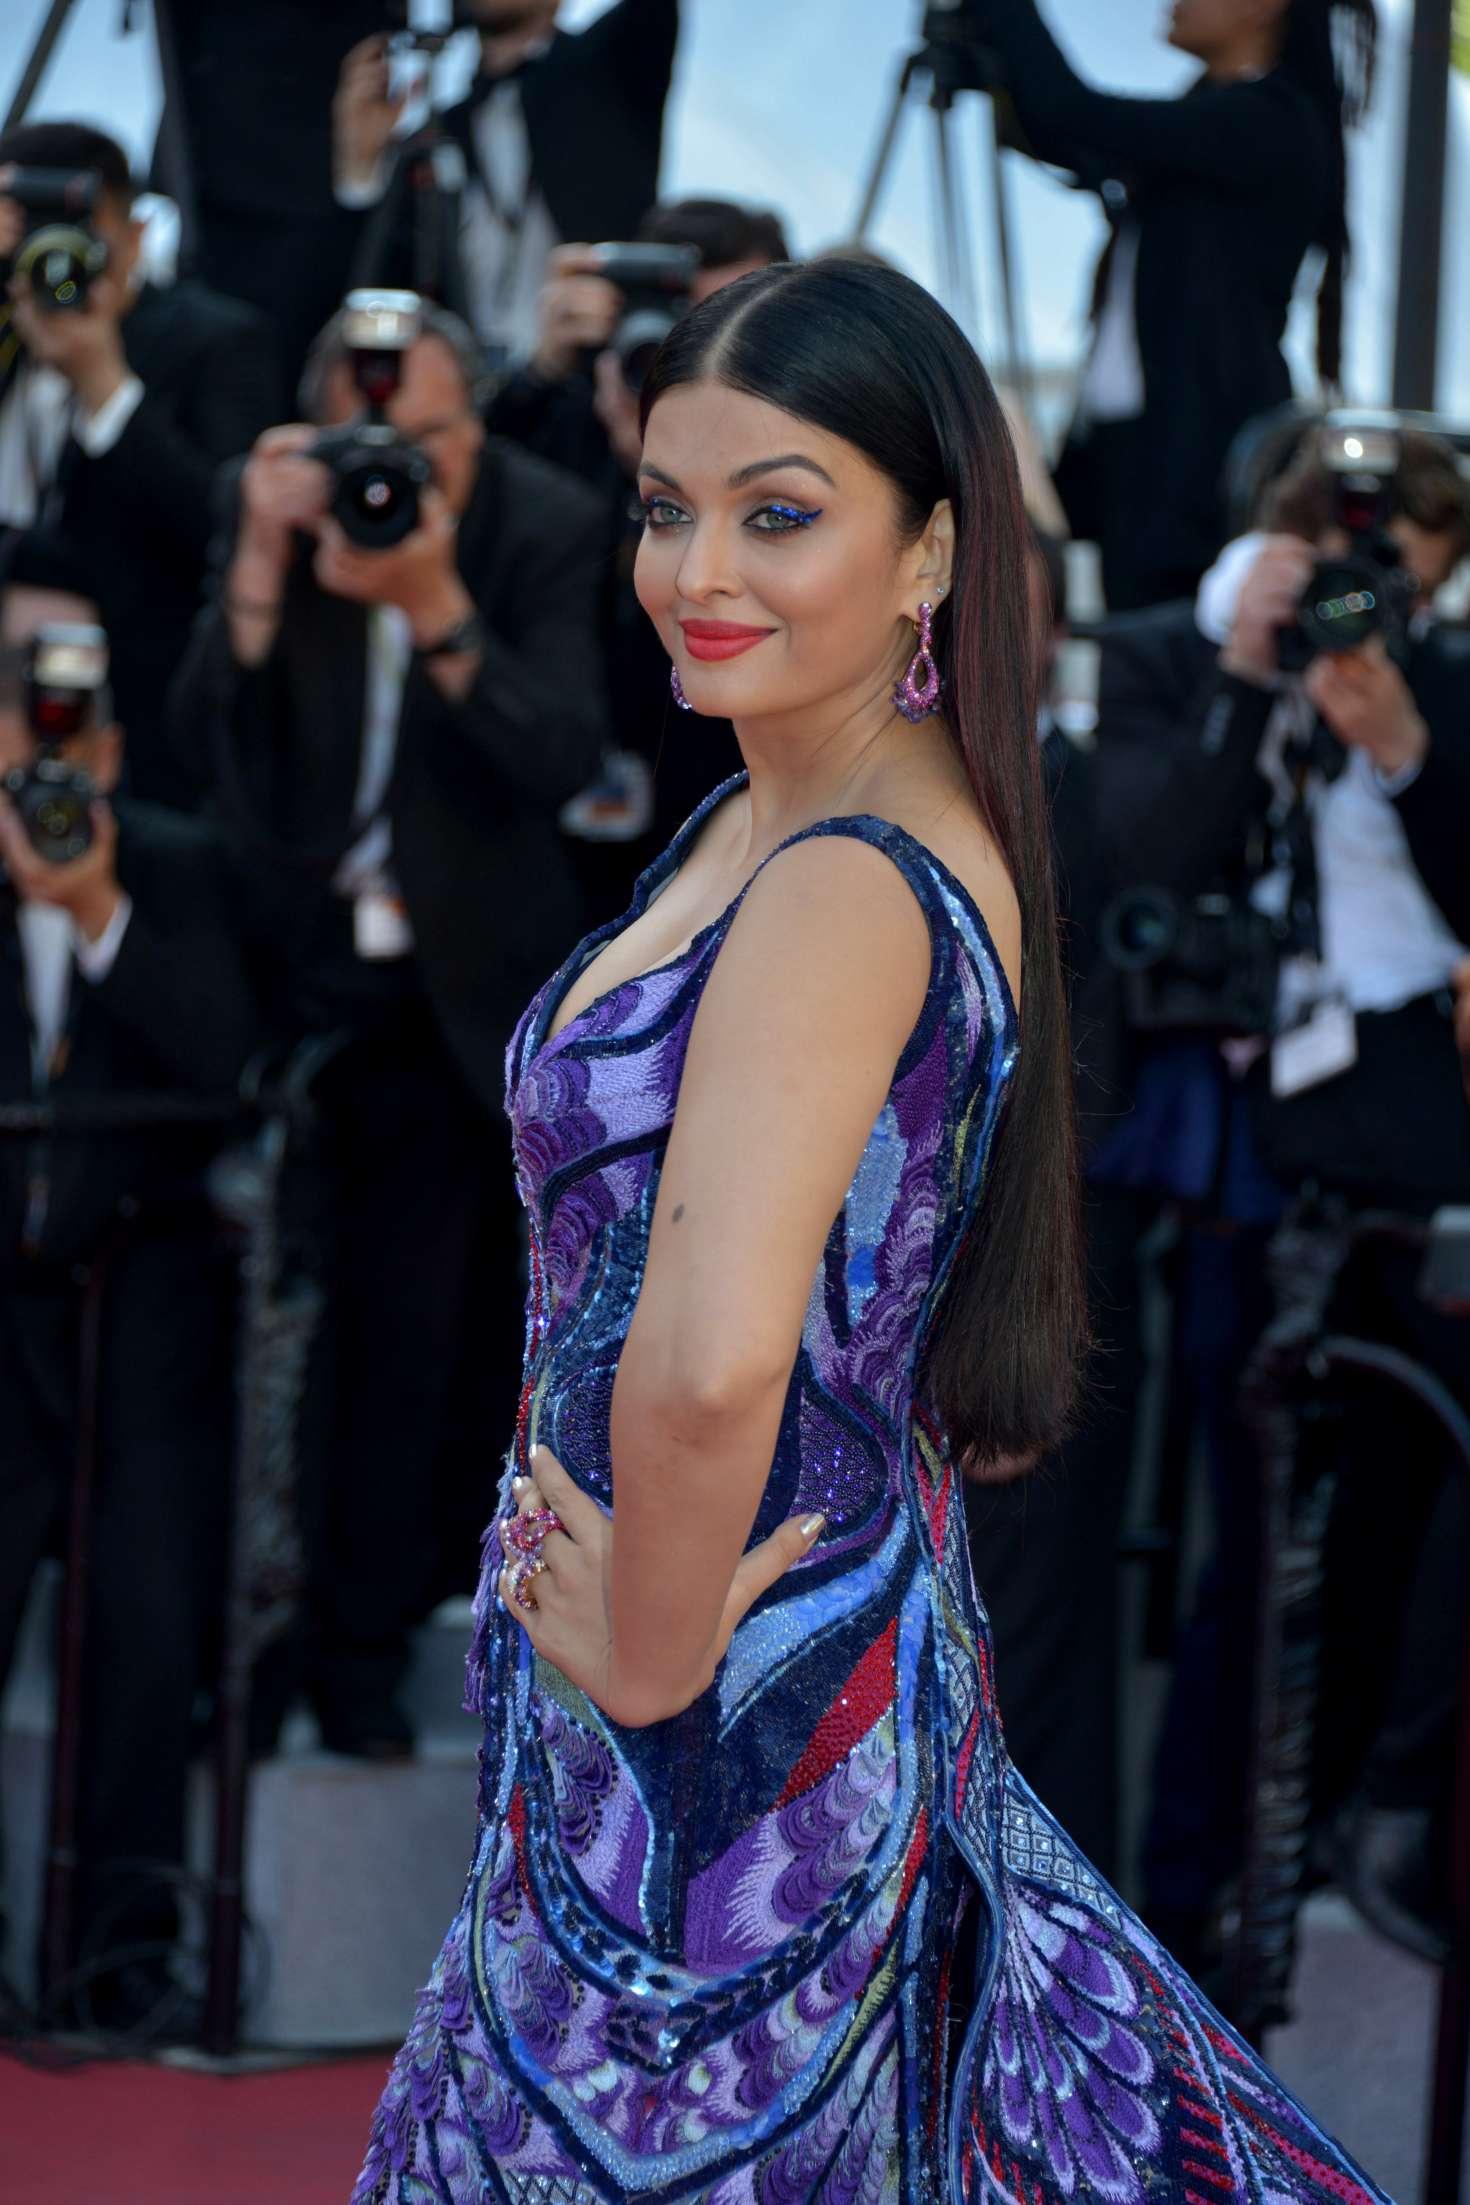 Aishwarya Rai Girls Of The Sun Premiere At 2018 Cannes Film